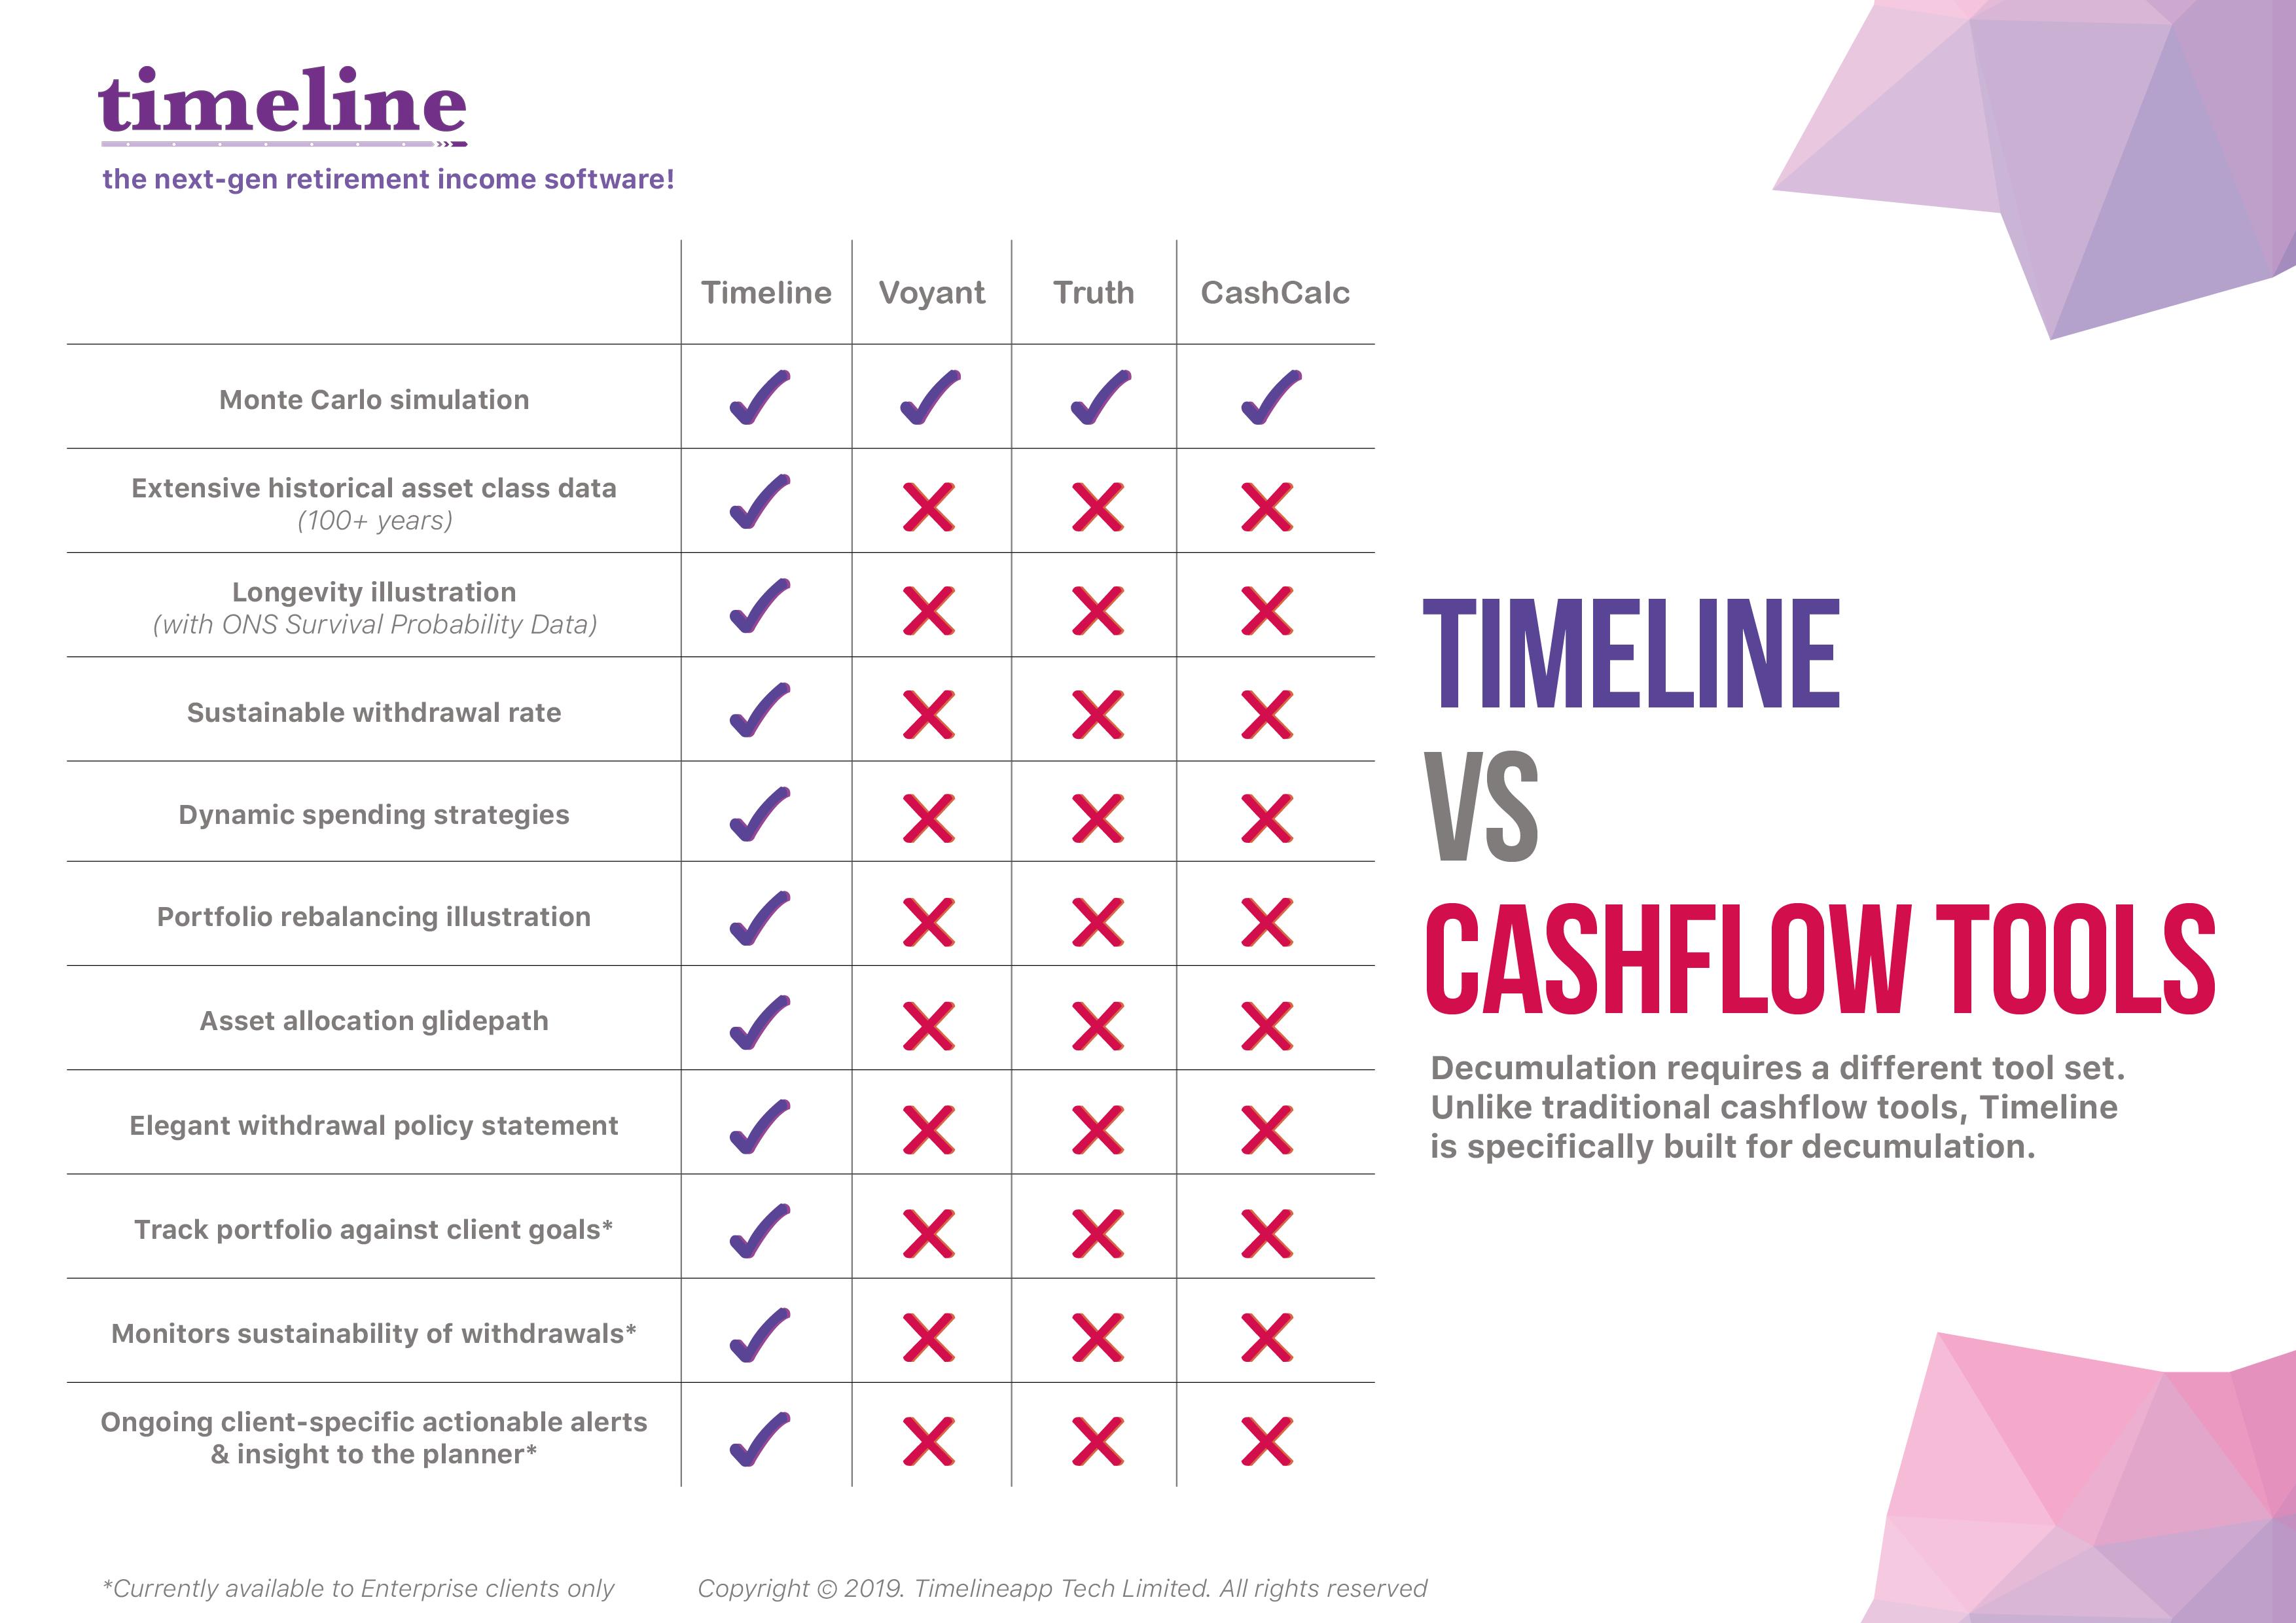 Timeline vs Cashflow Tools